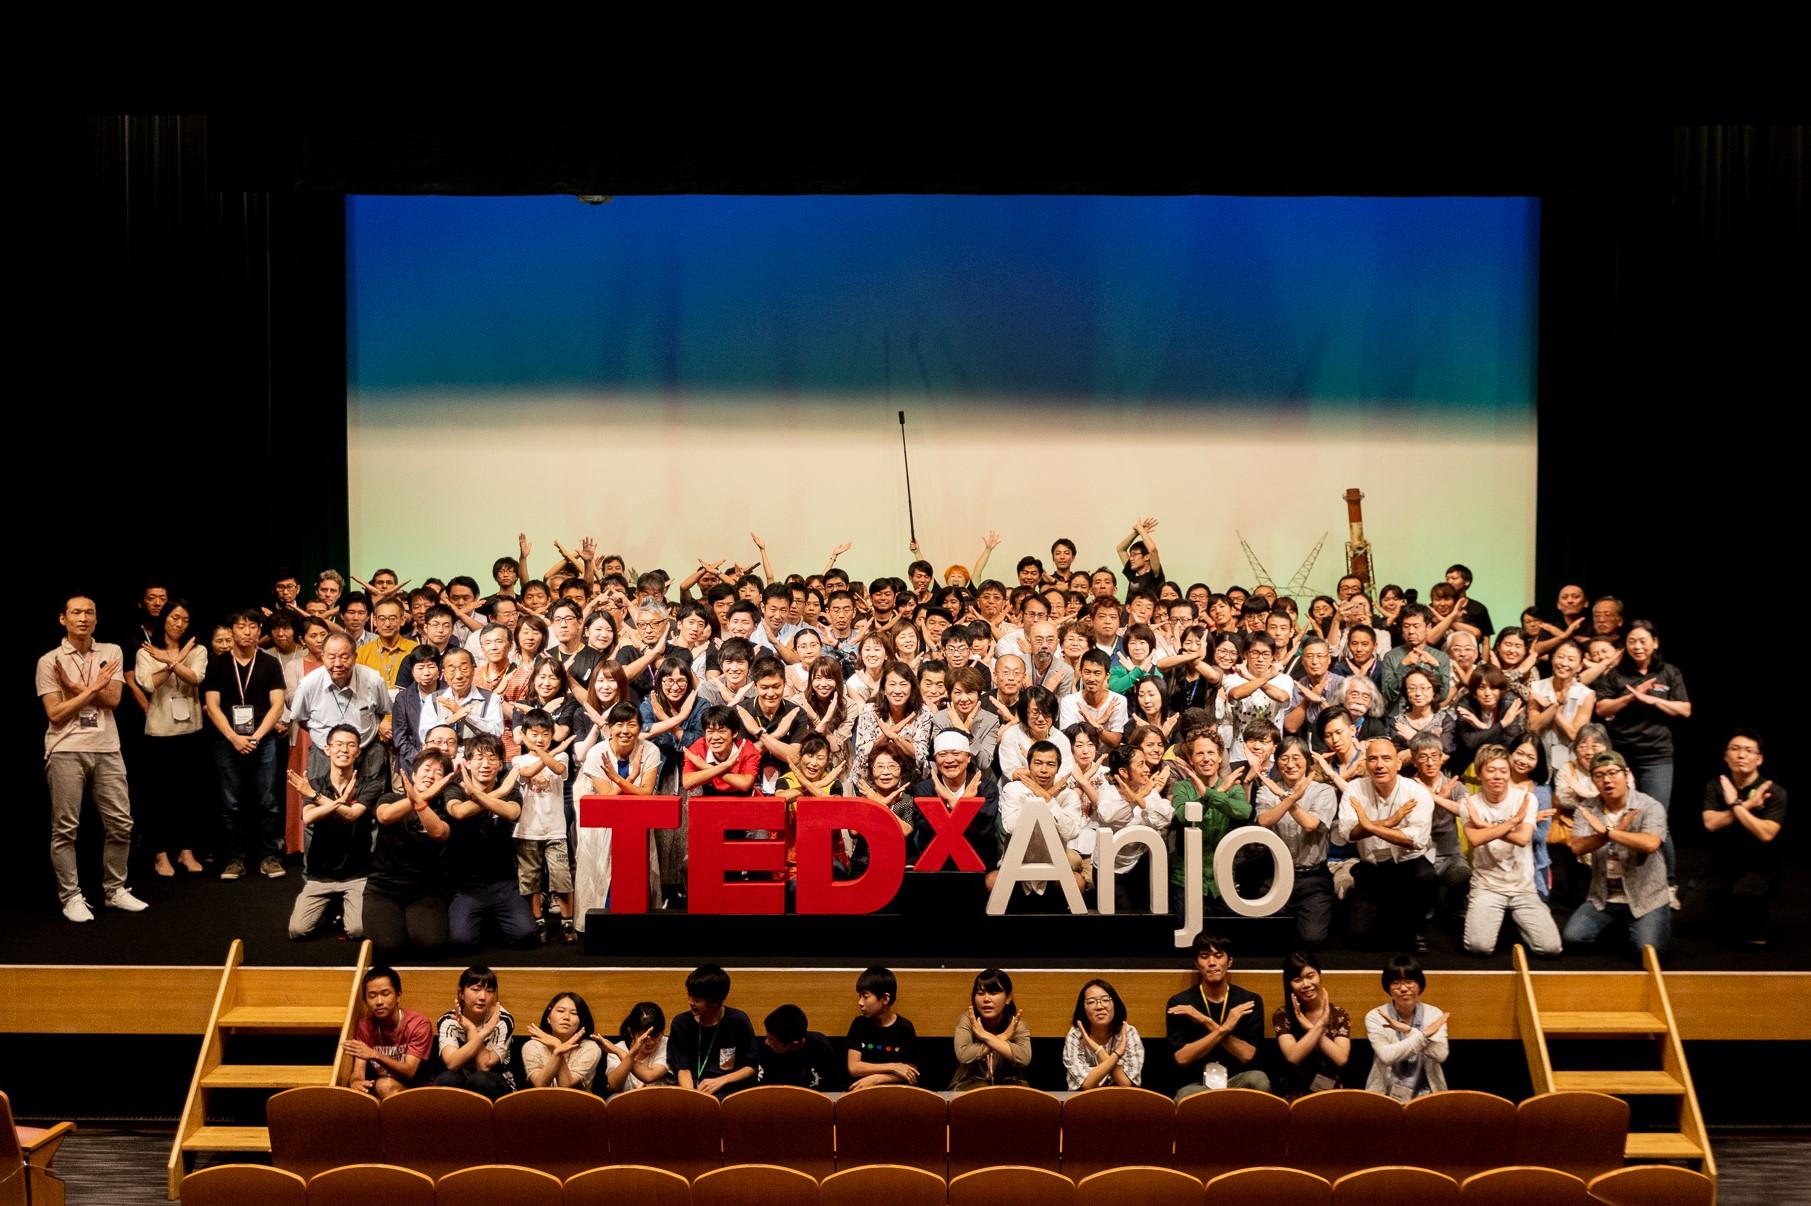 TEDxAnjo2019の写真を公開しました!